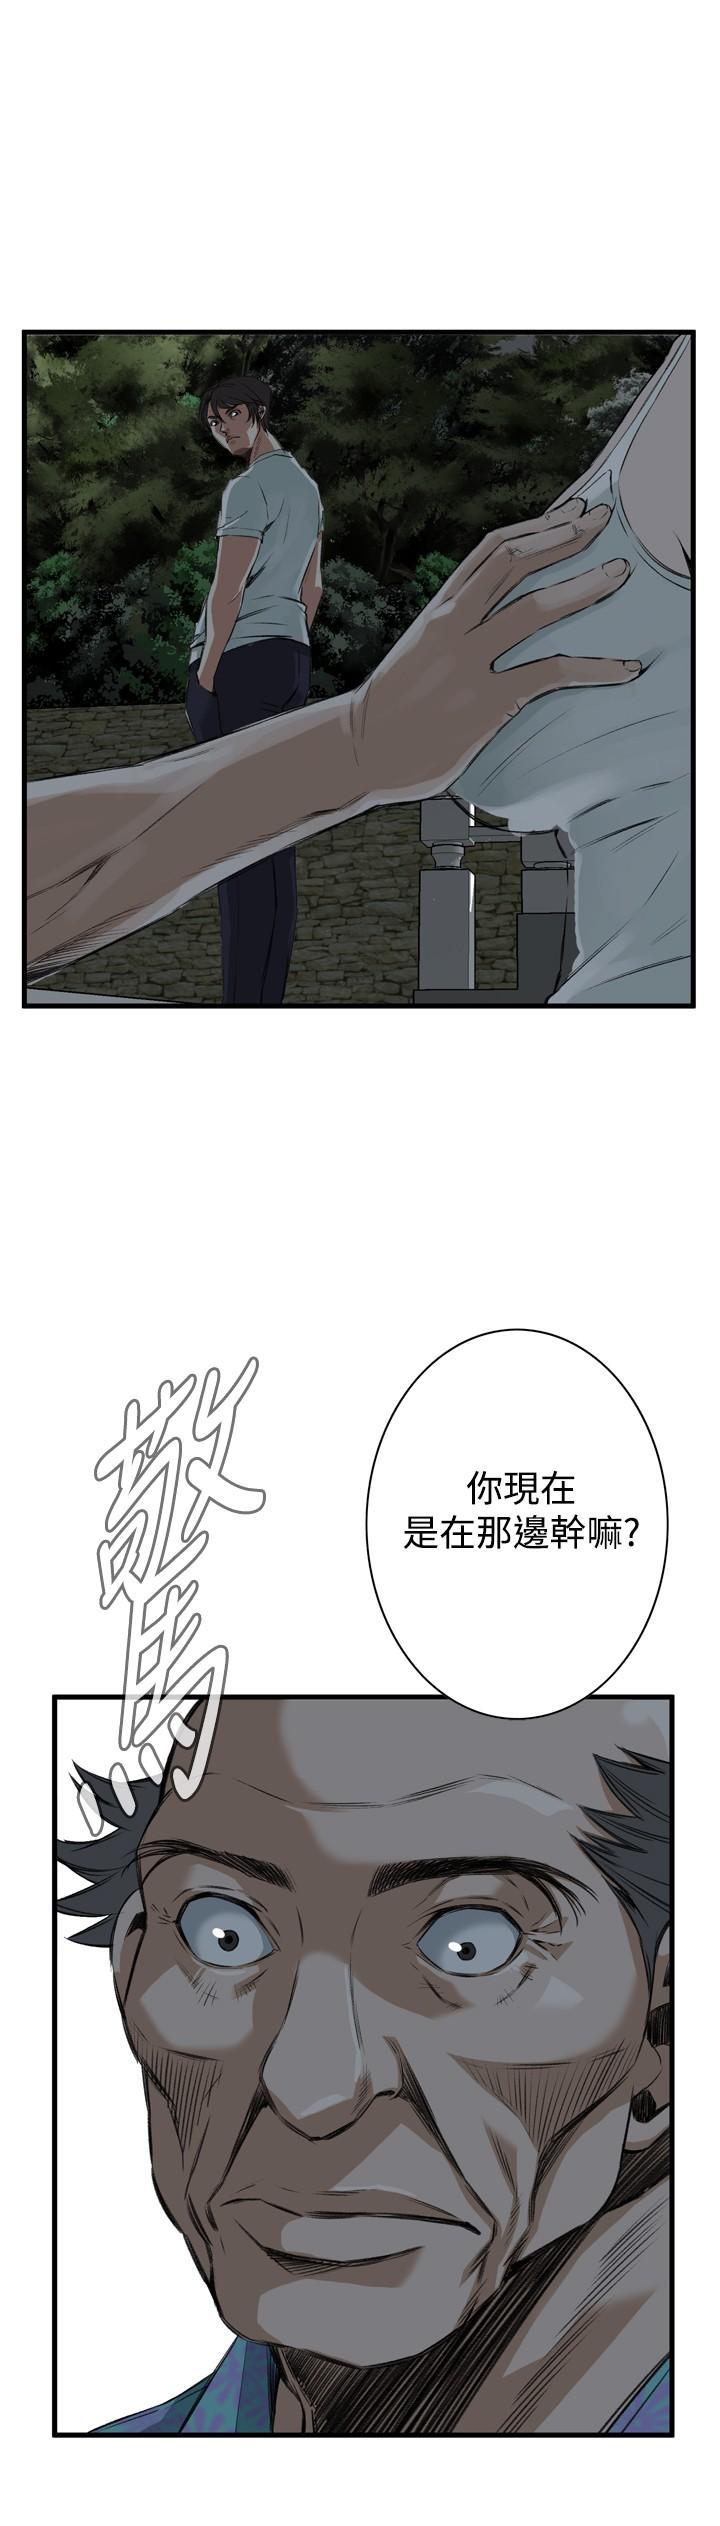 Take a Peek 偷窥 Ch.39~51 [Chinese]中文 204